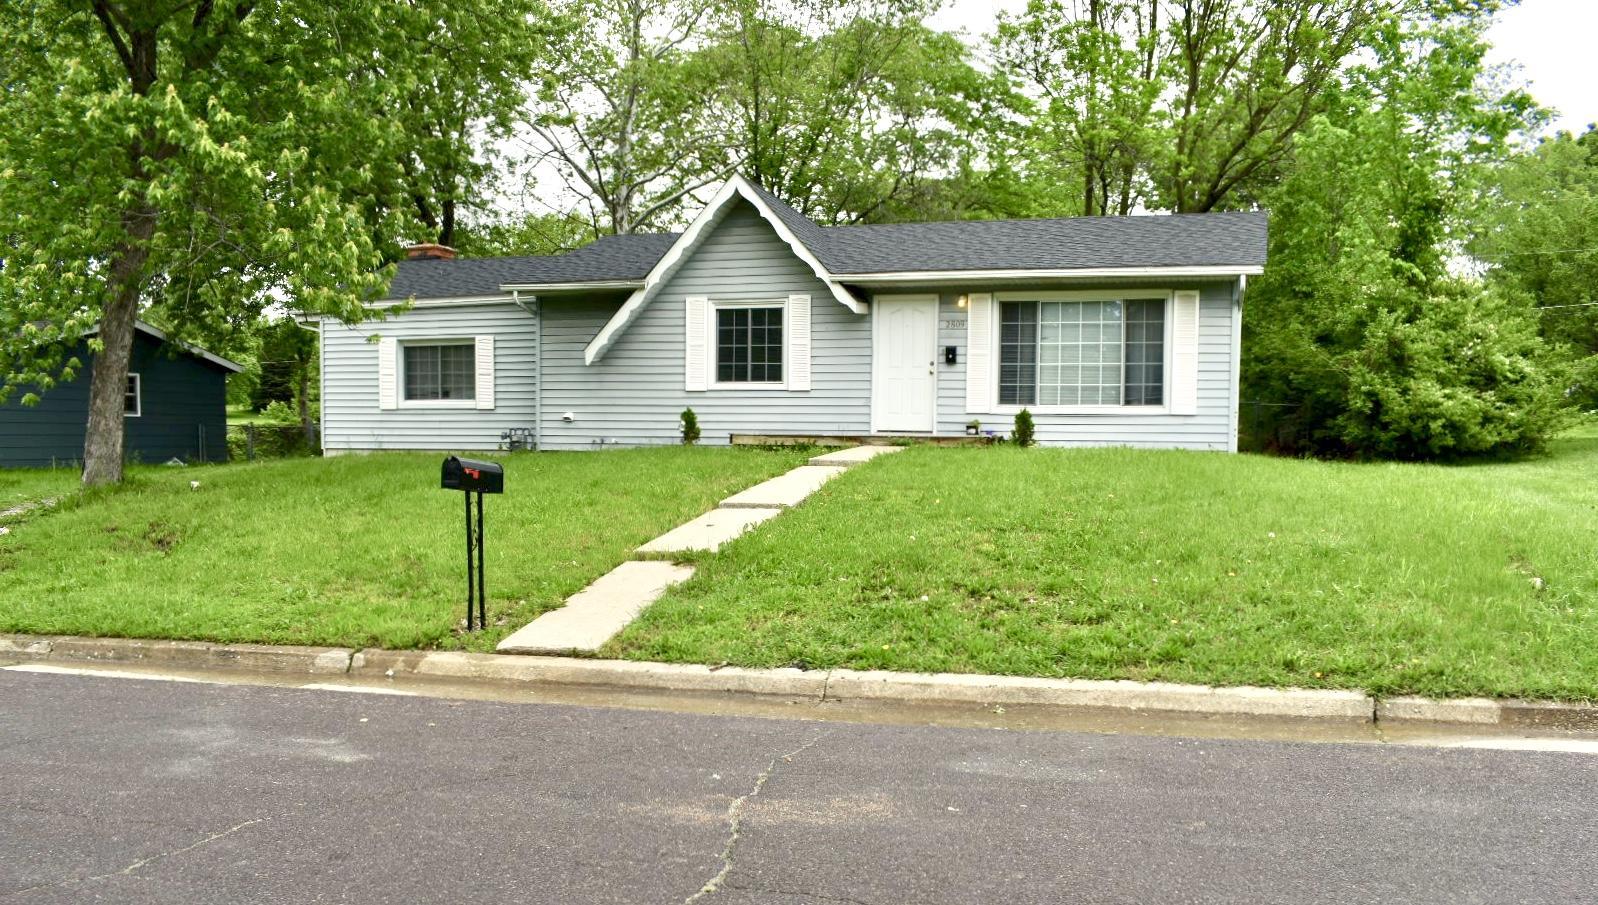 2809 N WILLOWBROOK RD, COLUMBIA, Missouri